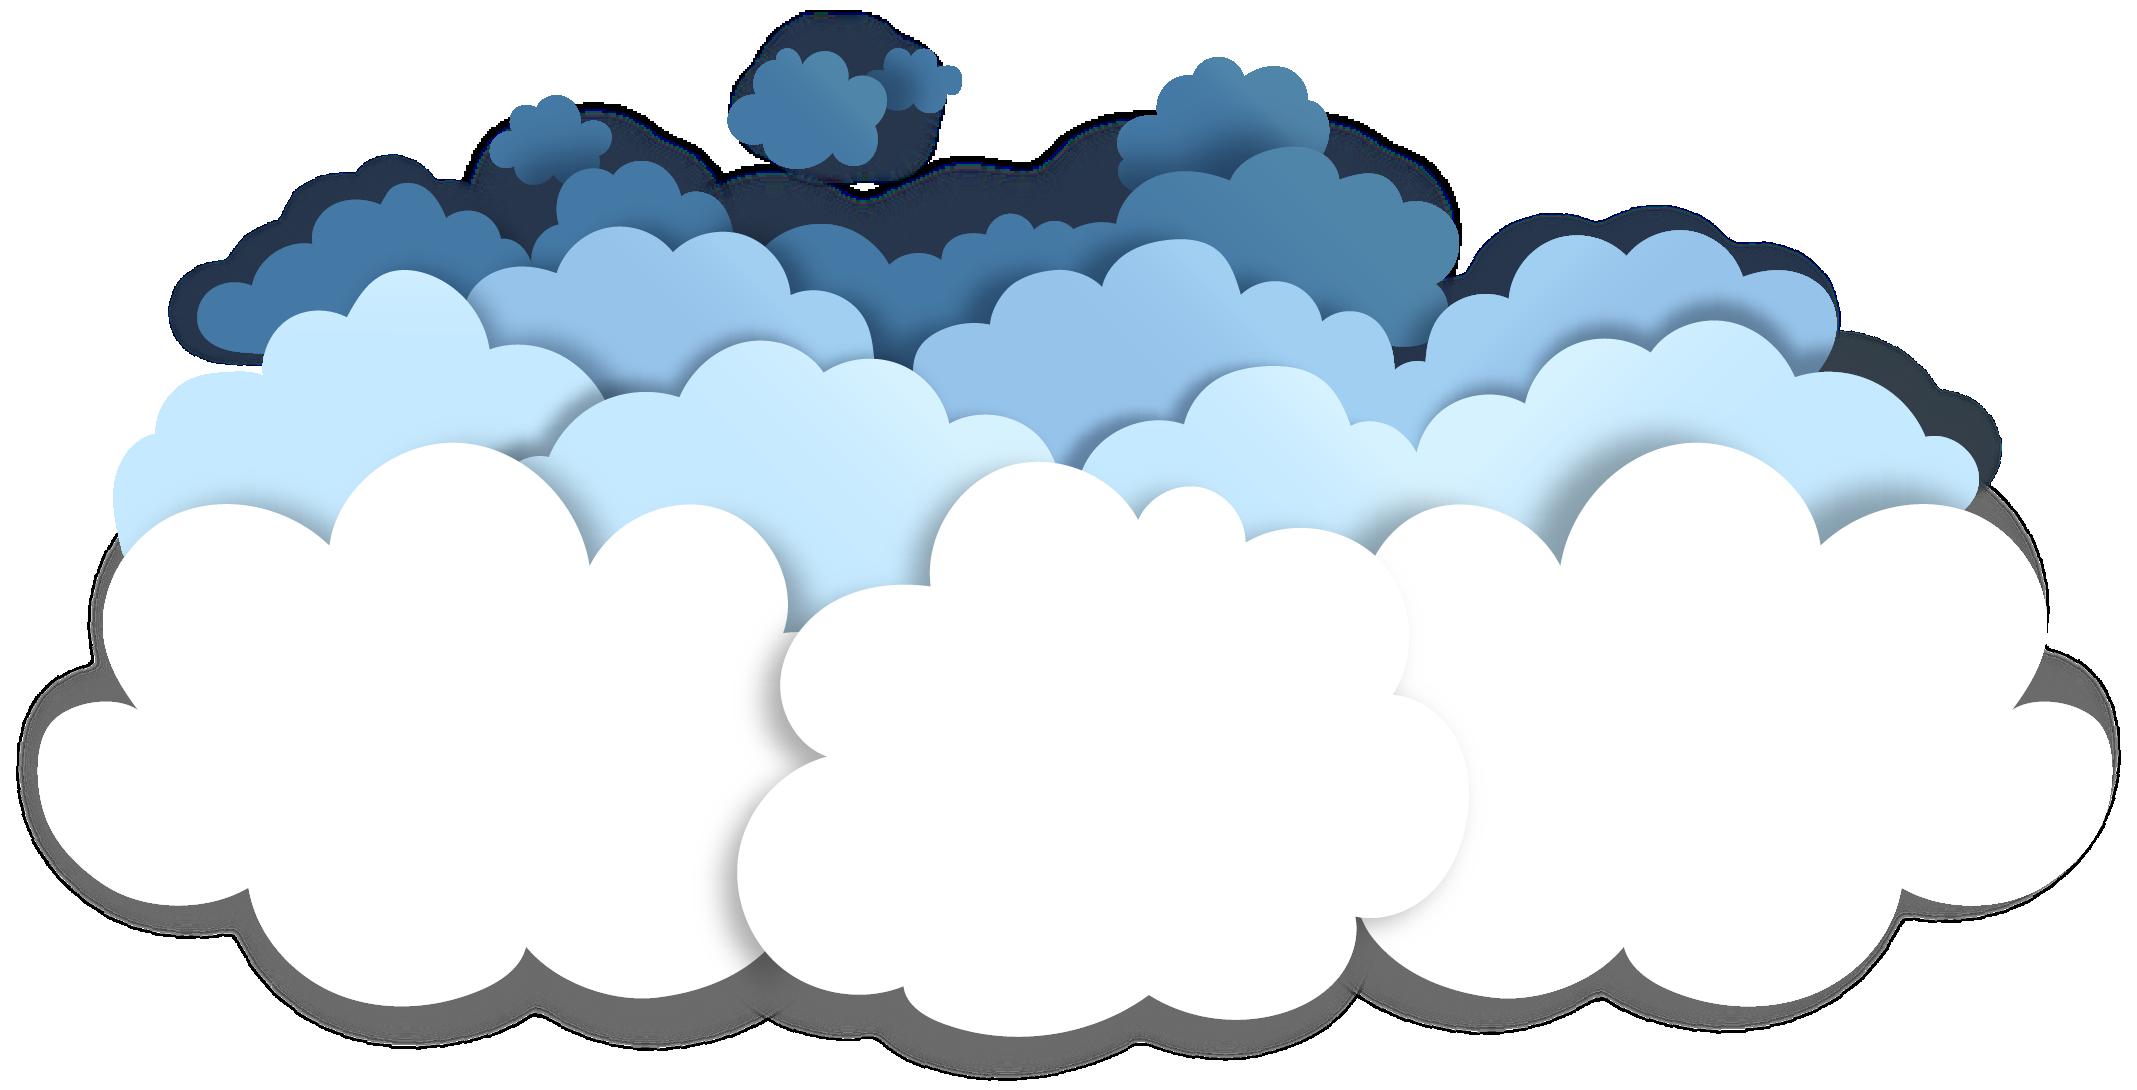 Clouds vector png. Papercutting cloud paper cutting